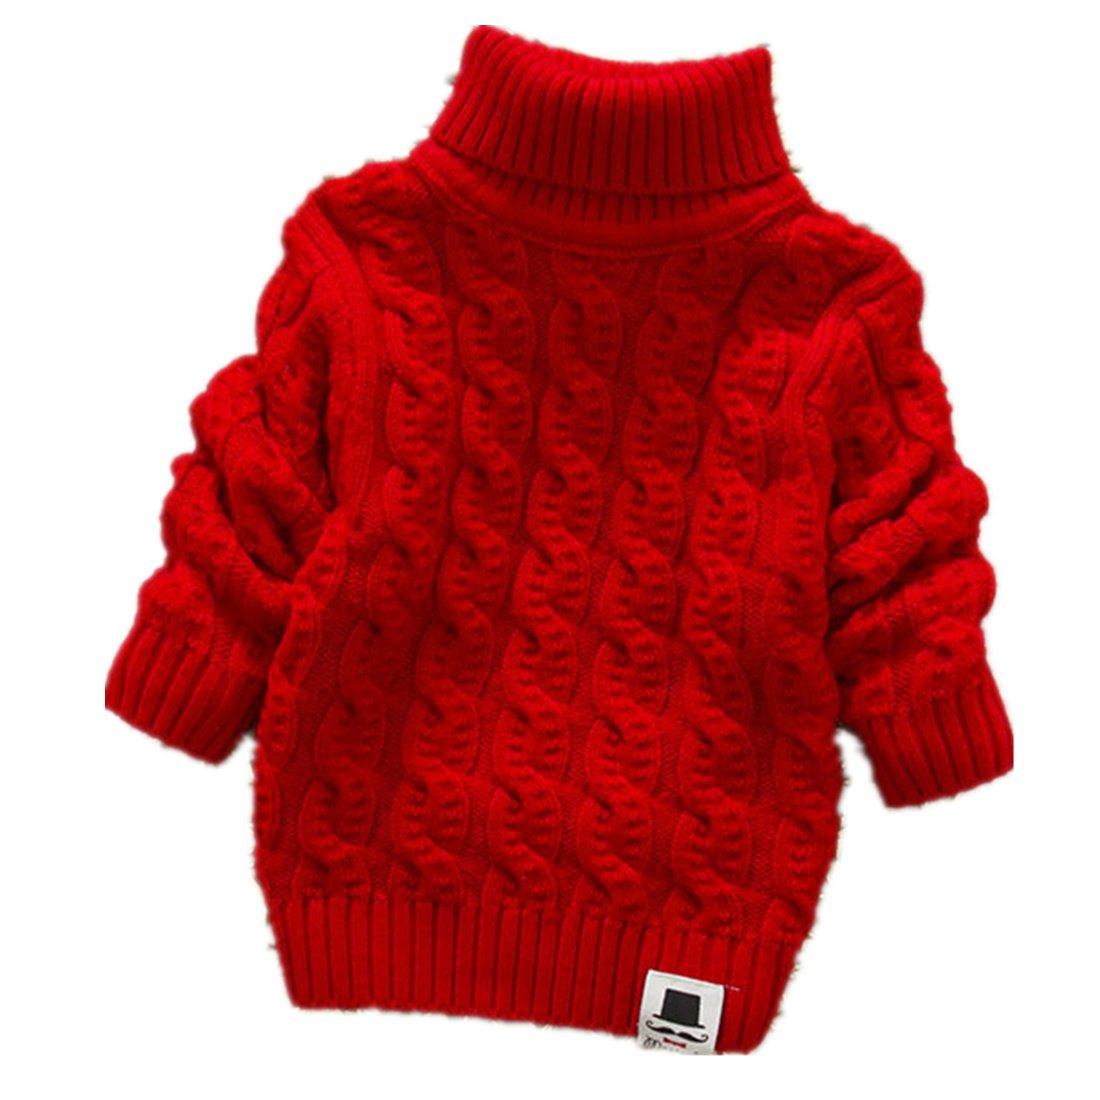 Boys Girls Turtleneck Sweaters Soft Warm Children's Sweater